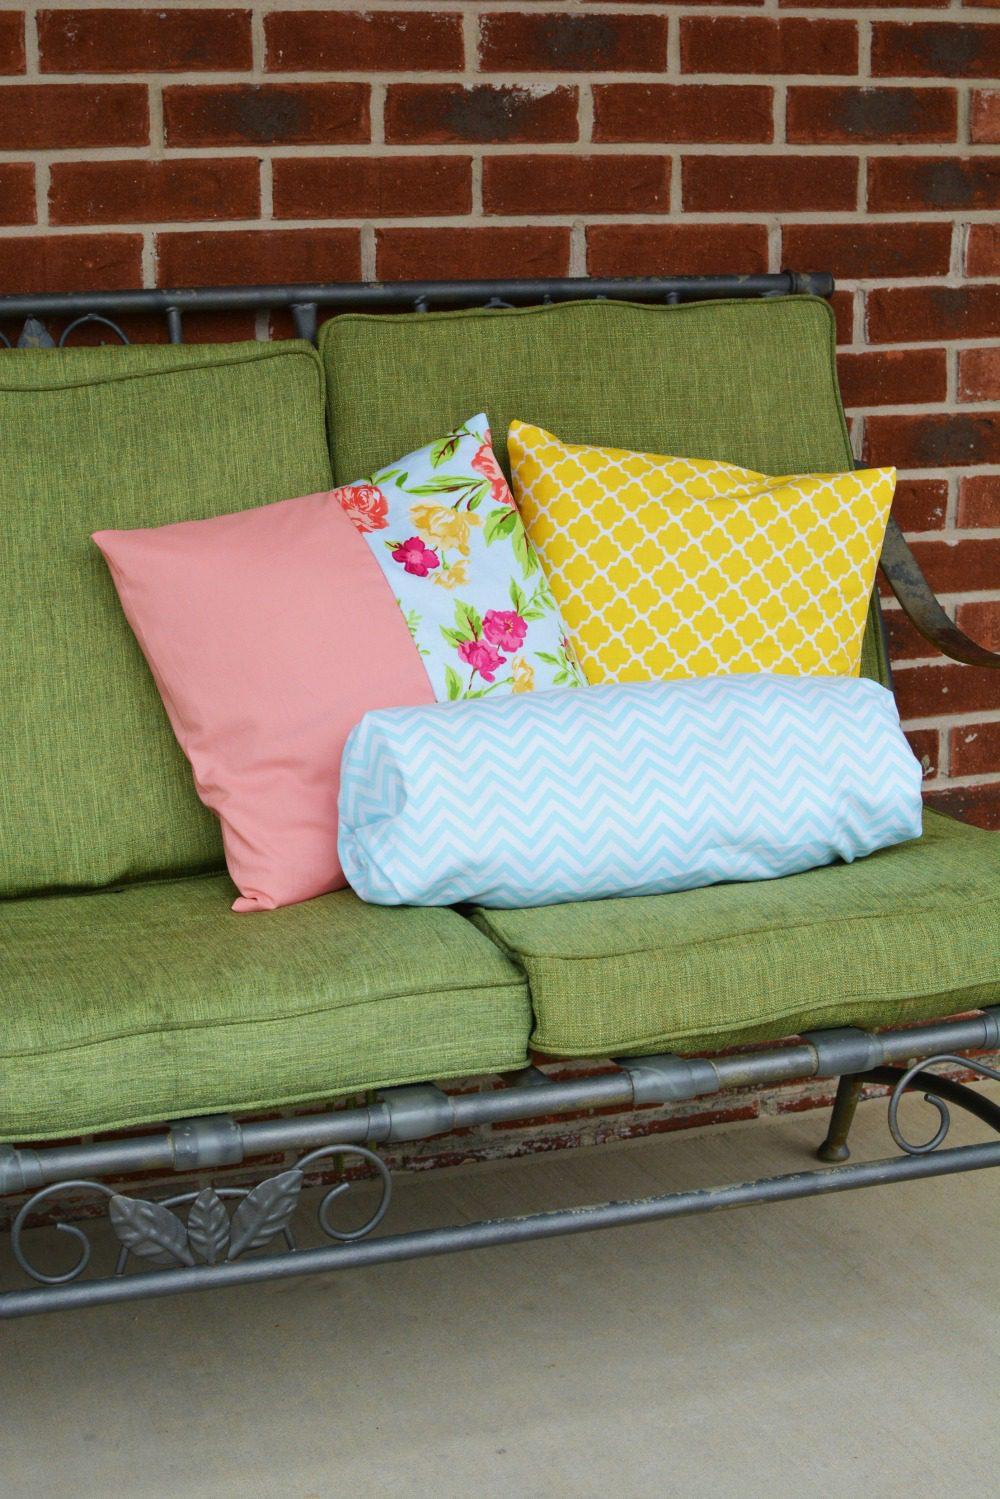 DIY Spring Throw and Bolster Pillows #WaverlyInspirations #InaWaverlyWorld